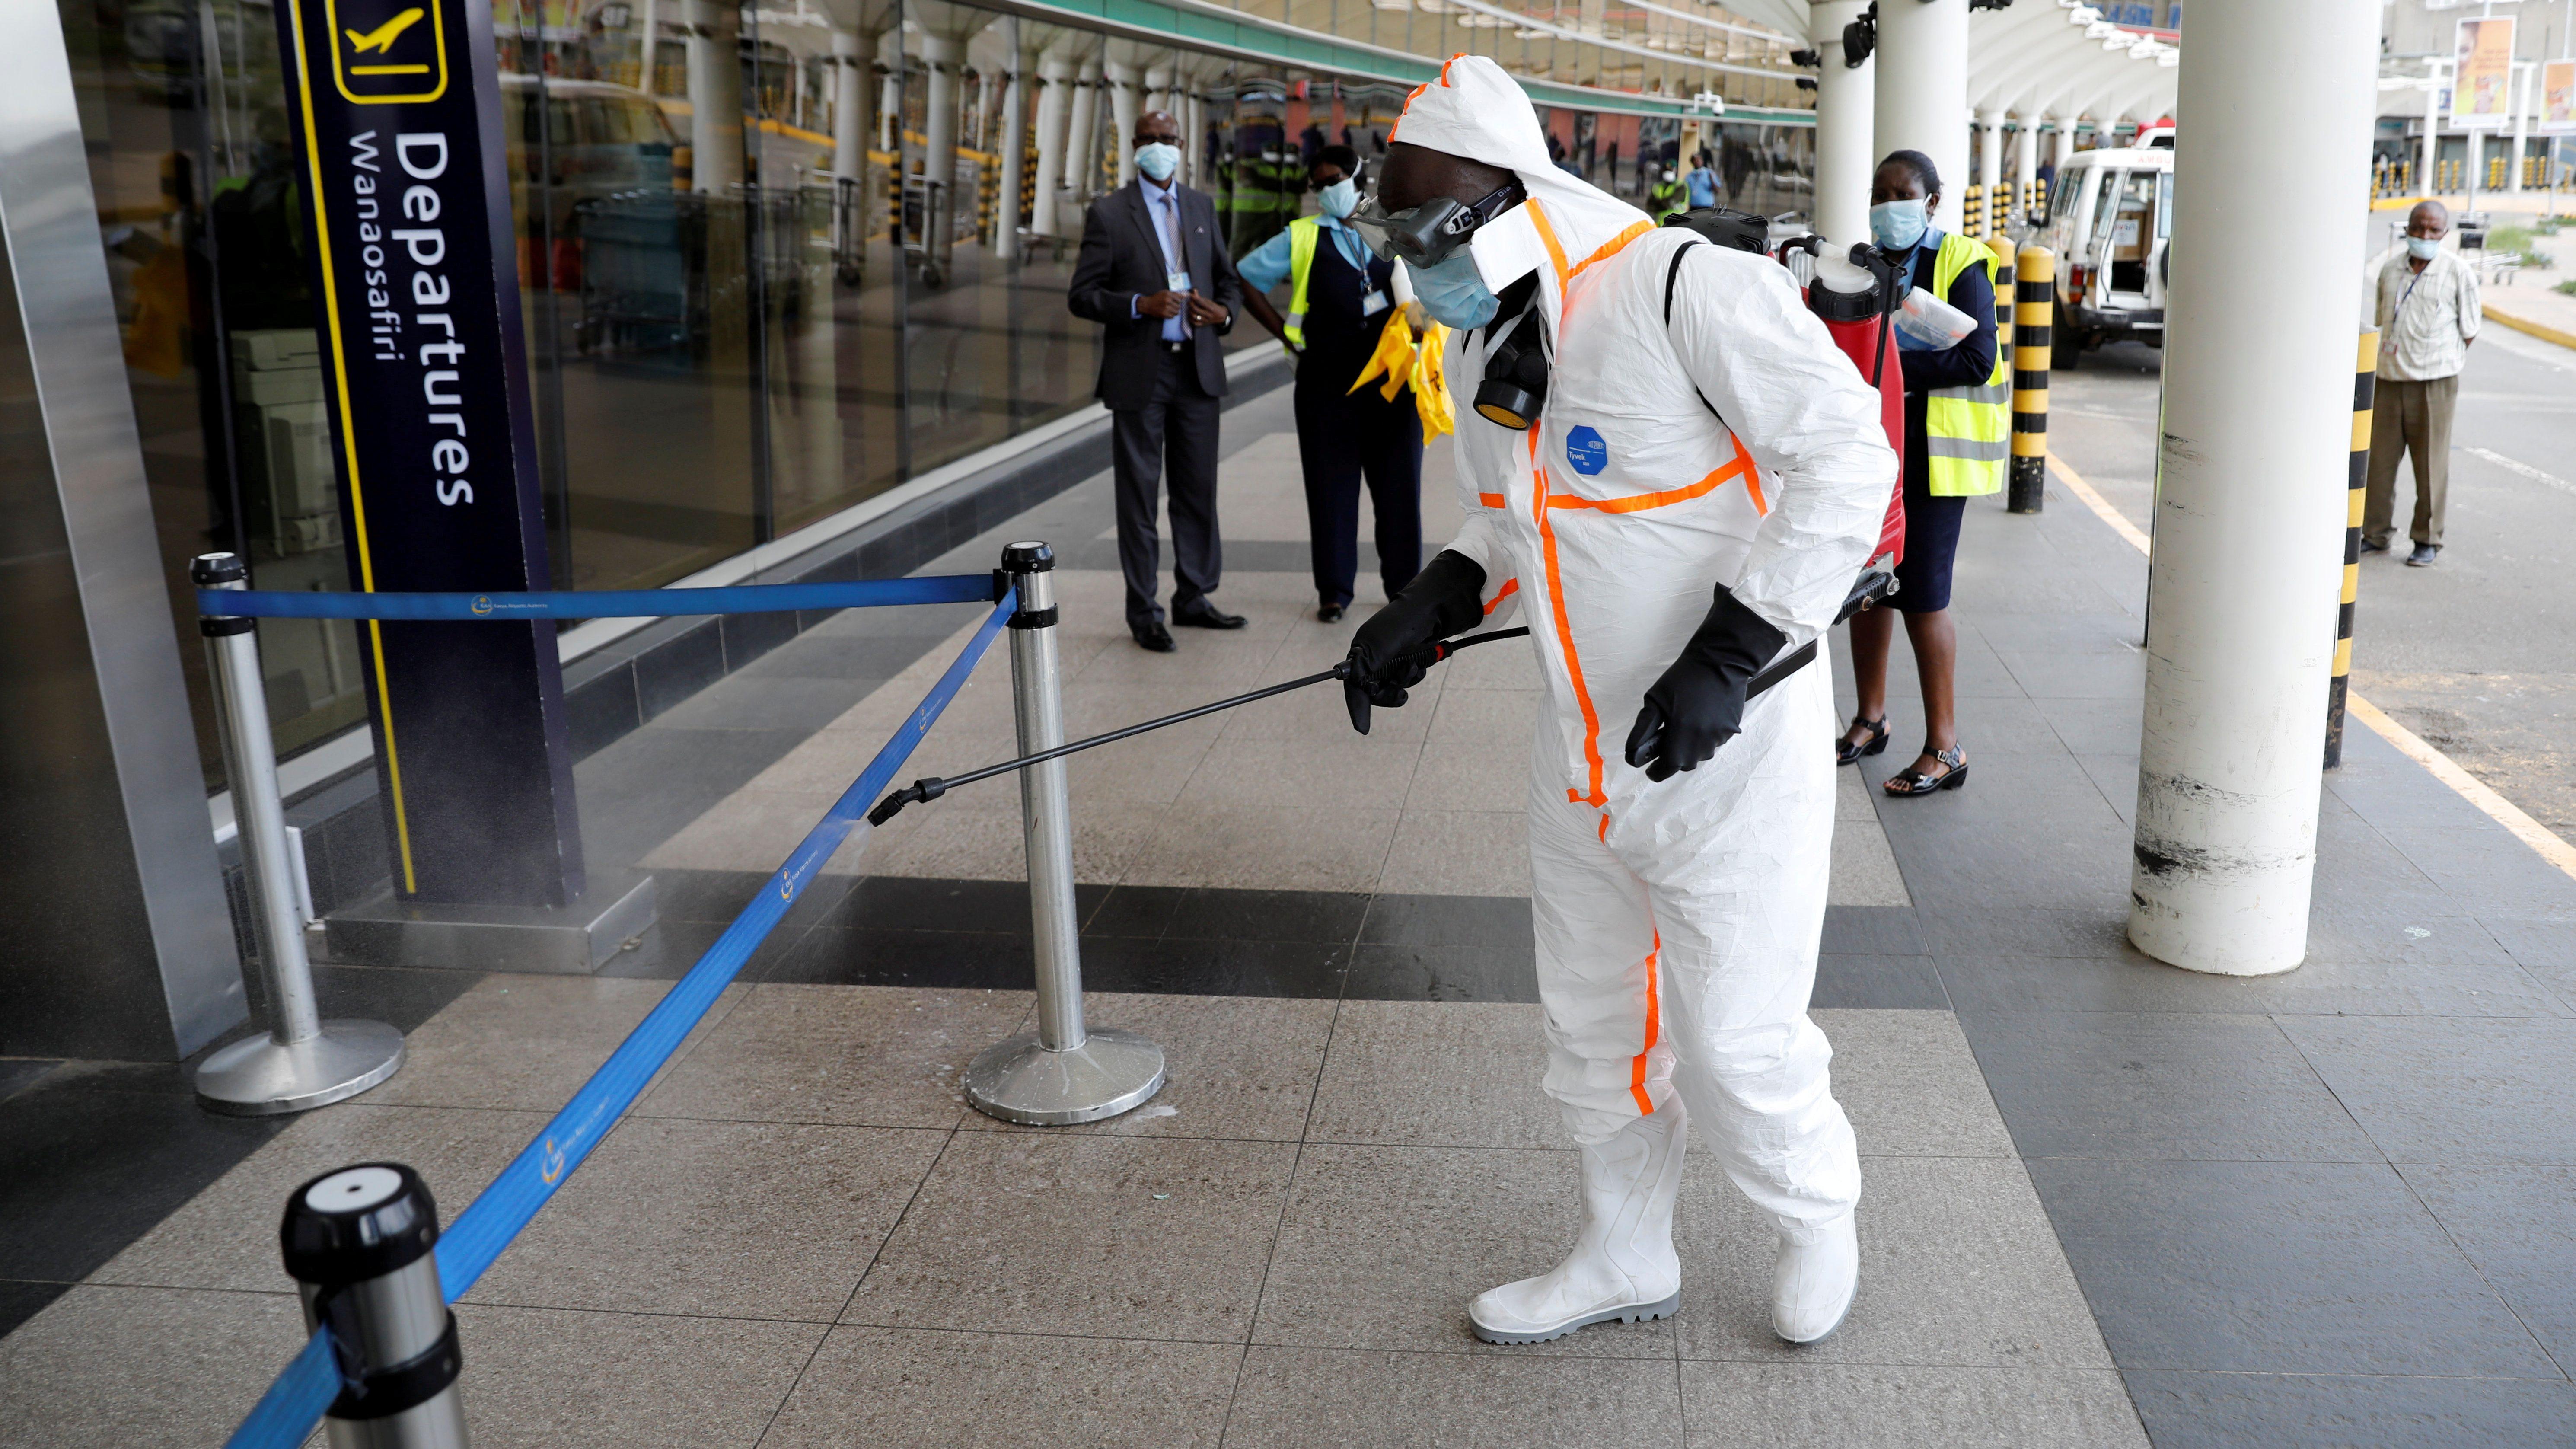 A health worker sprays disinfectant to prevent a Covid-19 outbreak at the Jomo Kenyatta International Airport in Nairobi, Kenya.